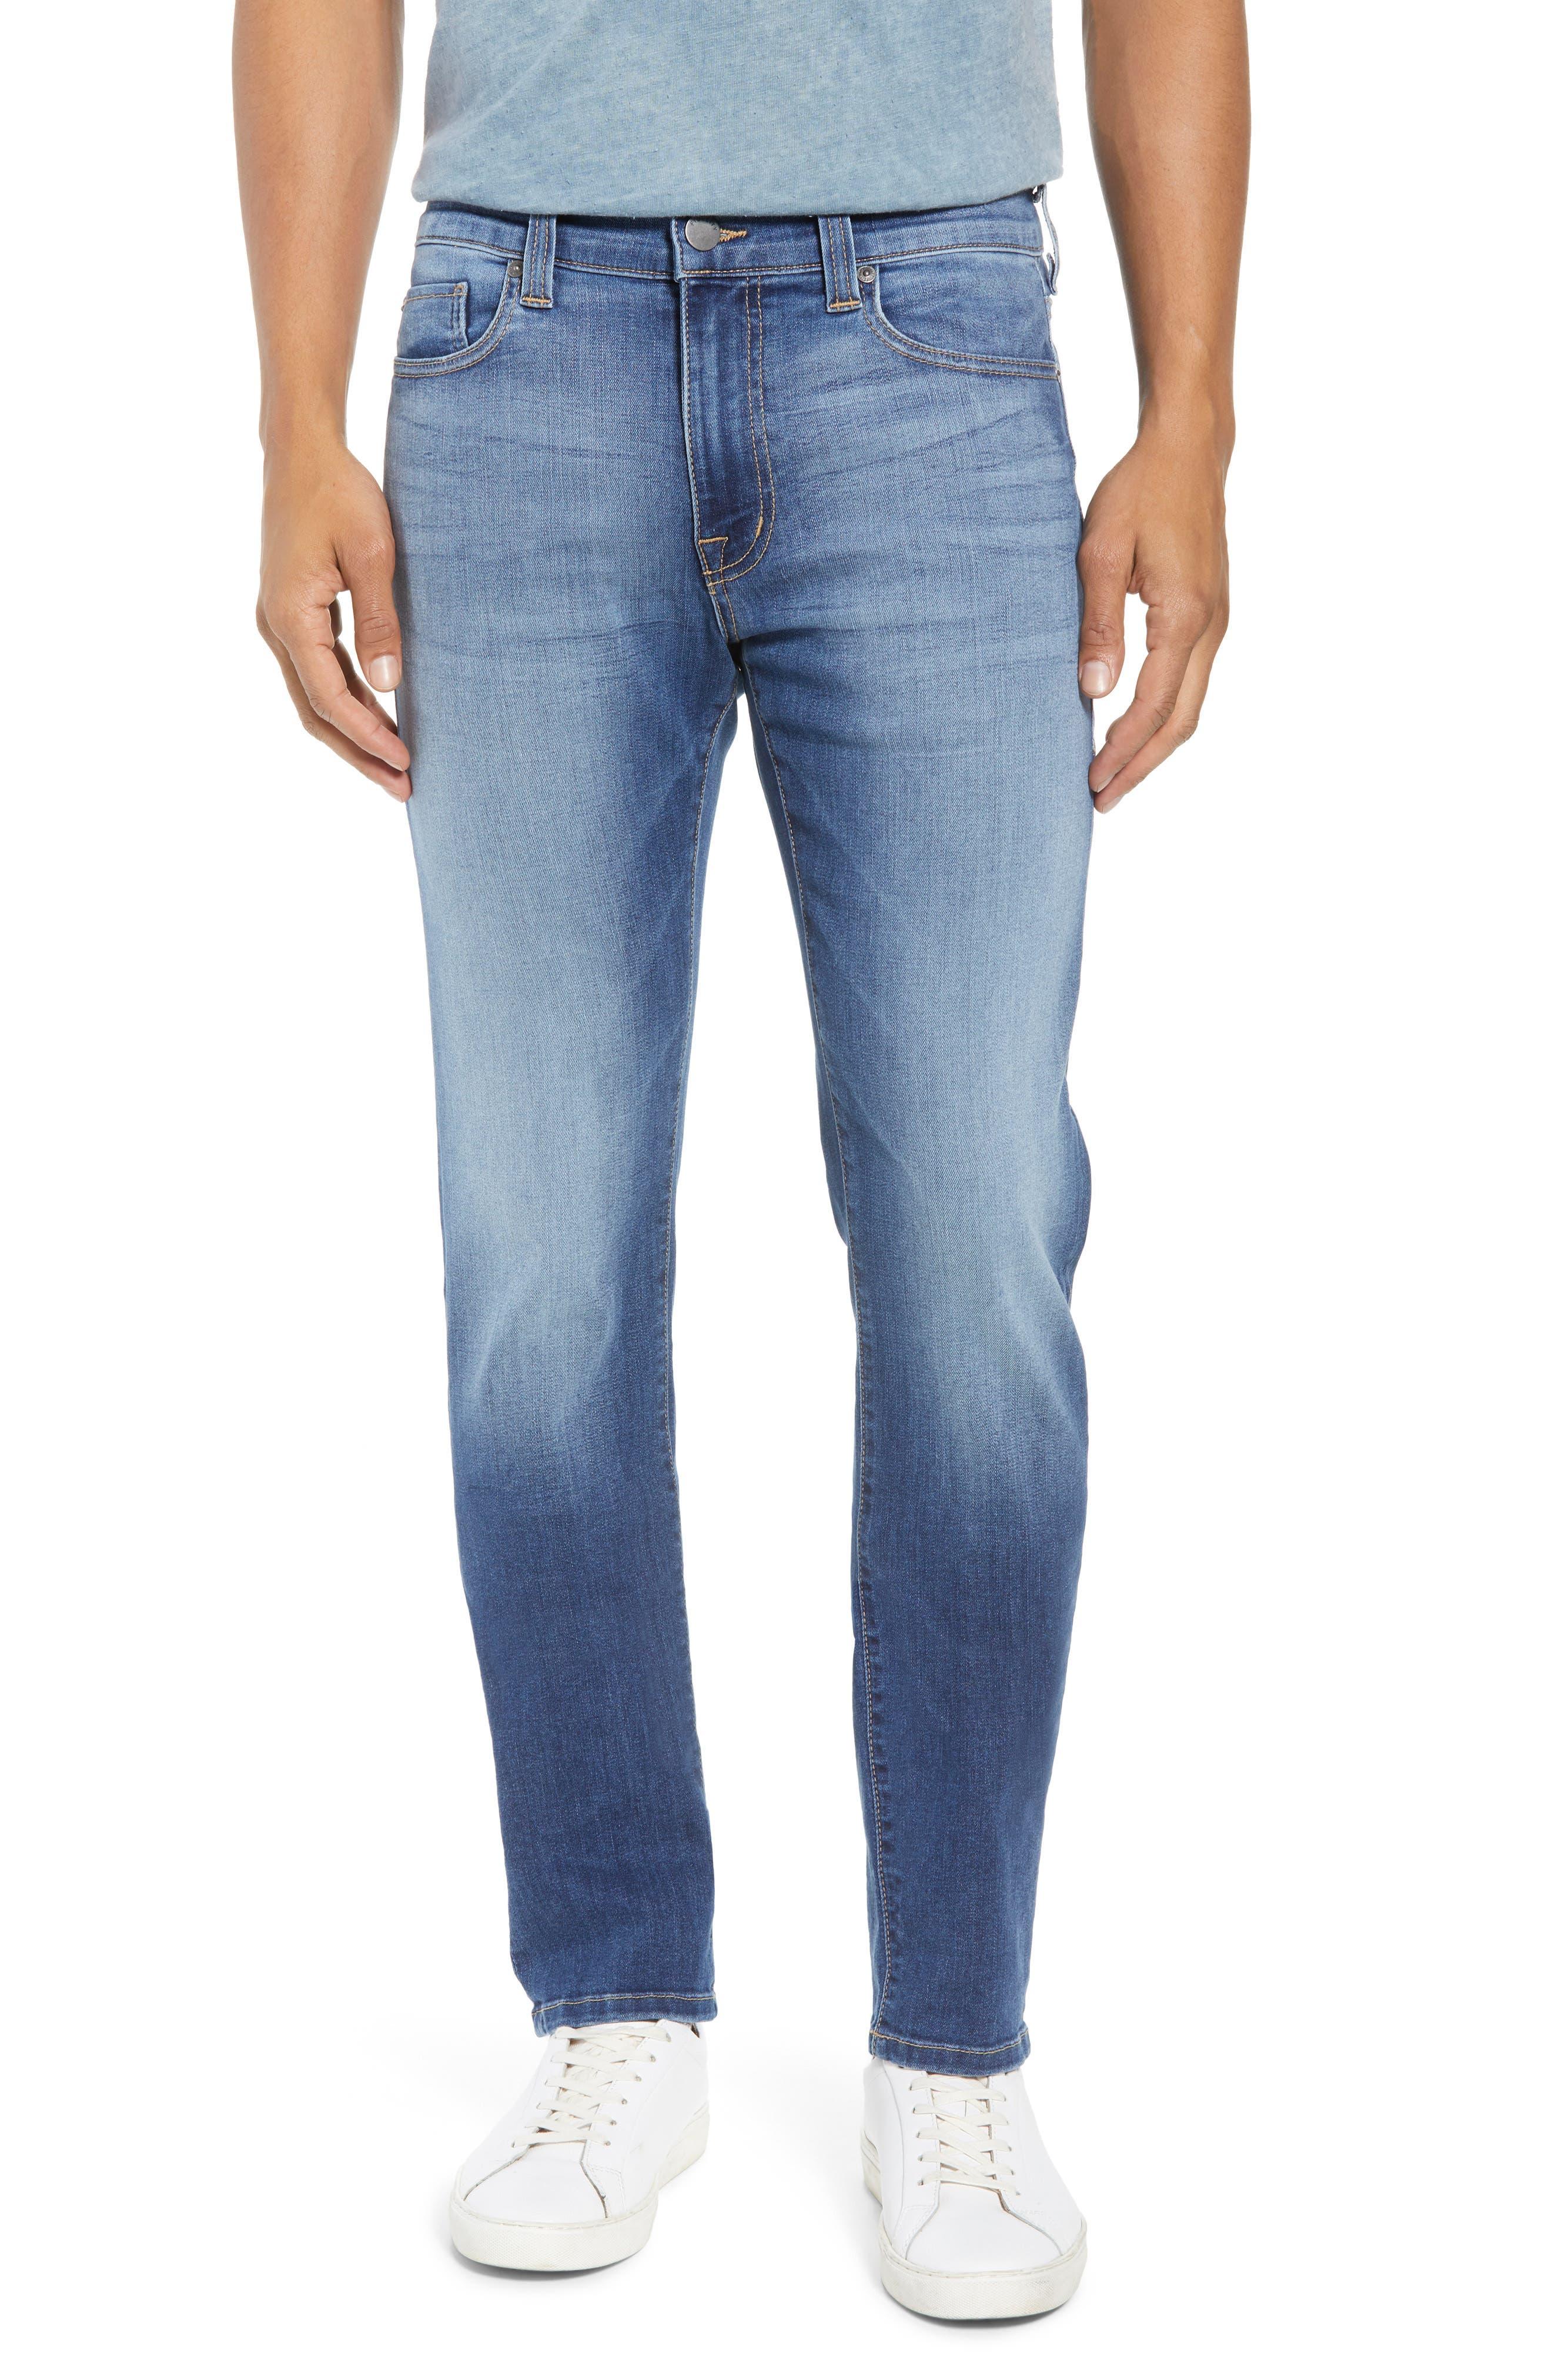 Torino Slim Fit Jeans,                         Main,                         color, Elysium Blue